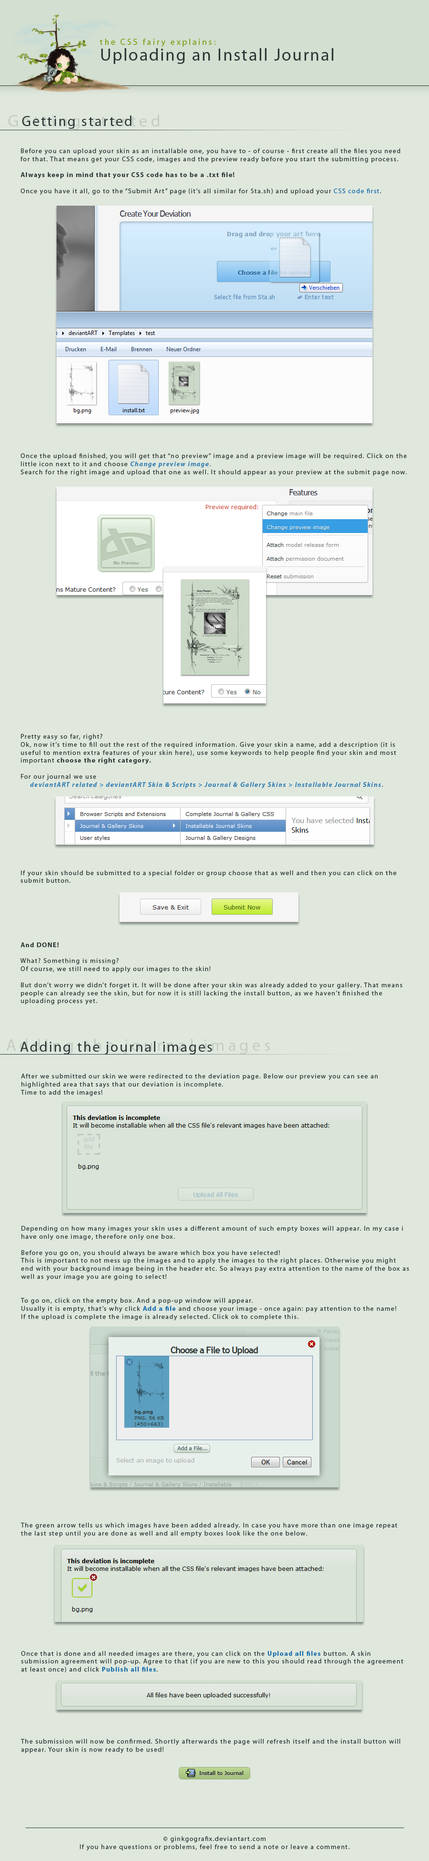 How to upload Journal Skins III by ginkgografix